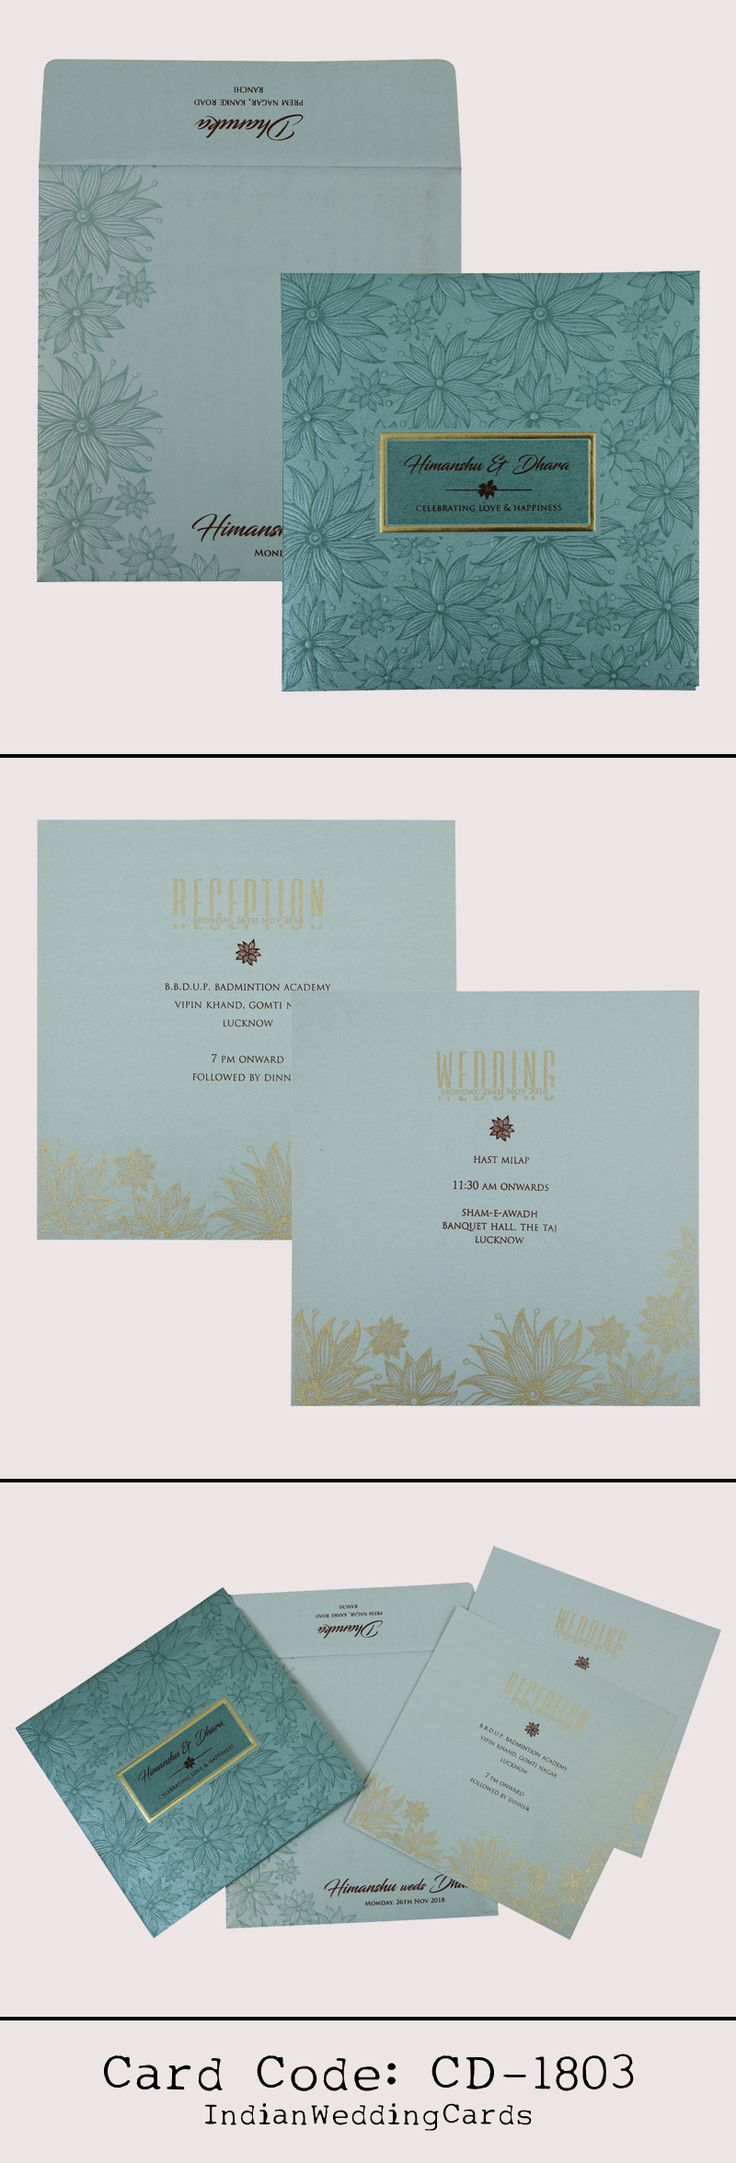 127 Best Wedding Invitations Unique Wedding Cards Images On Pinterest